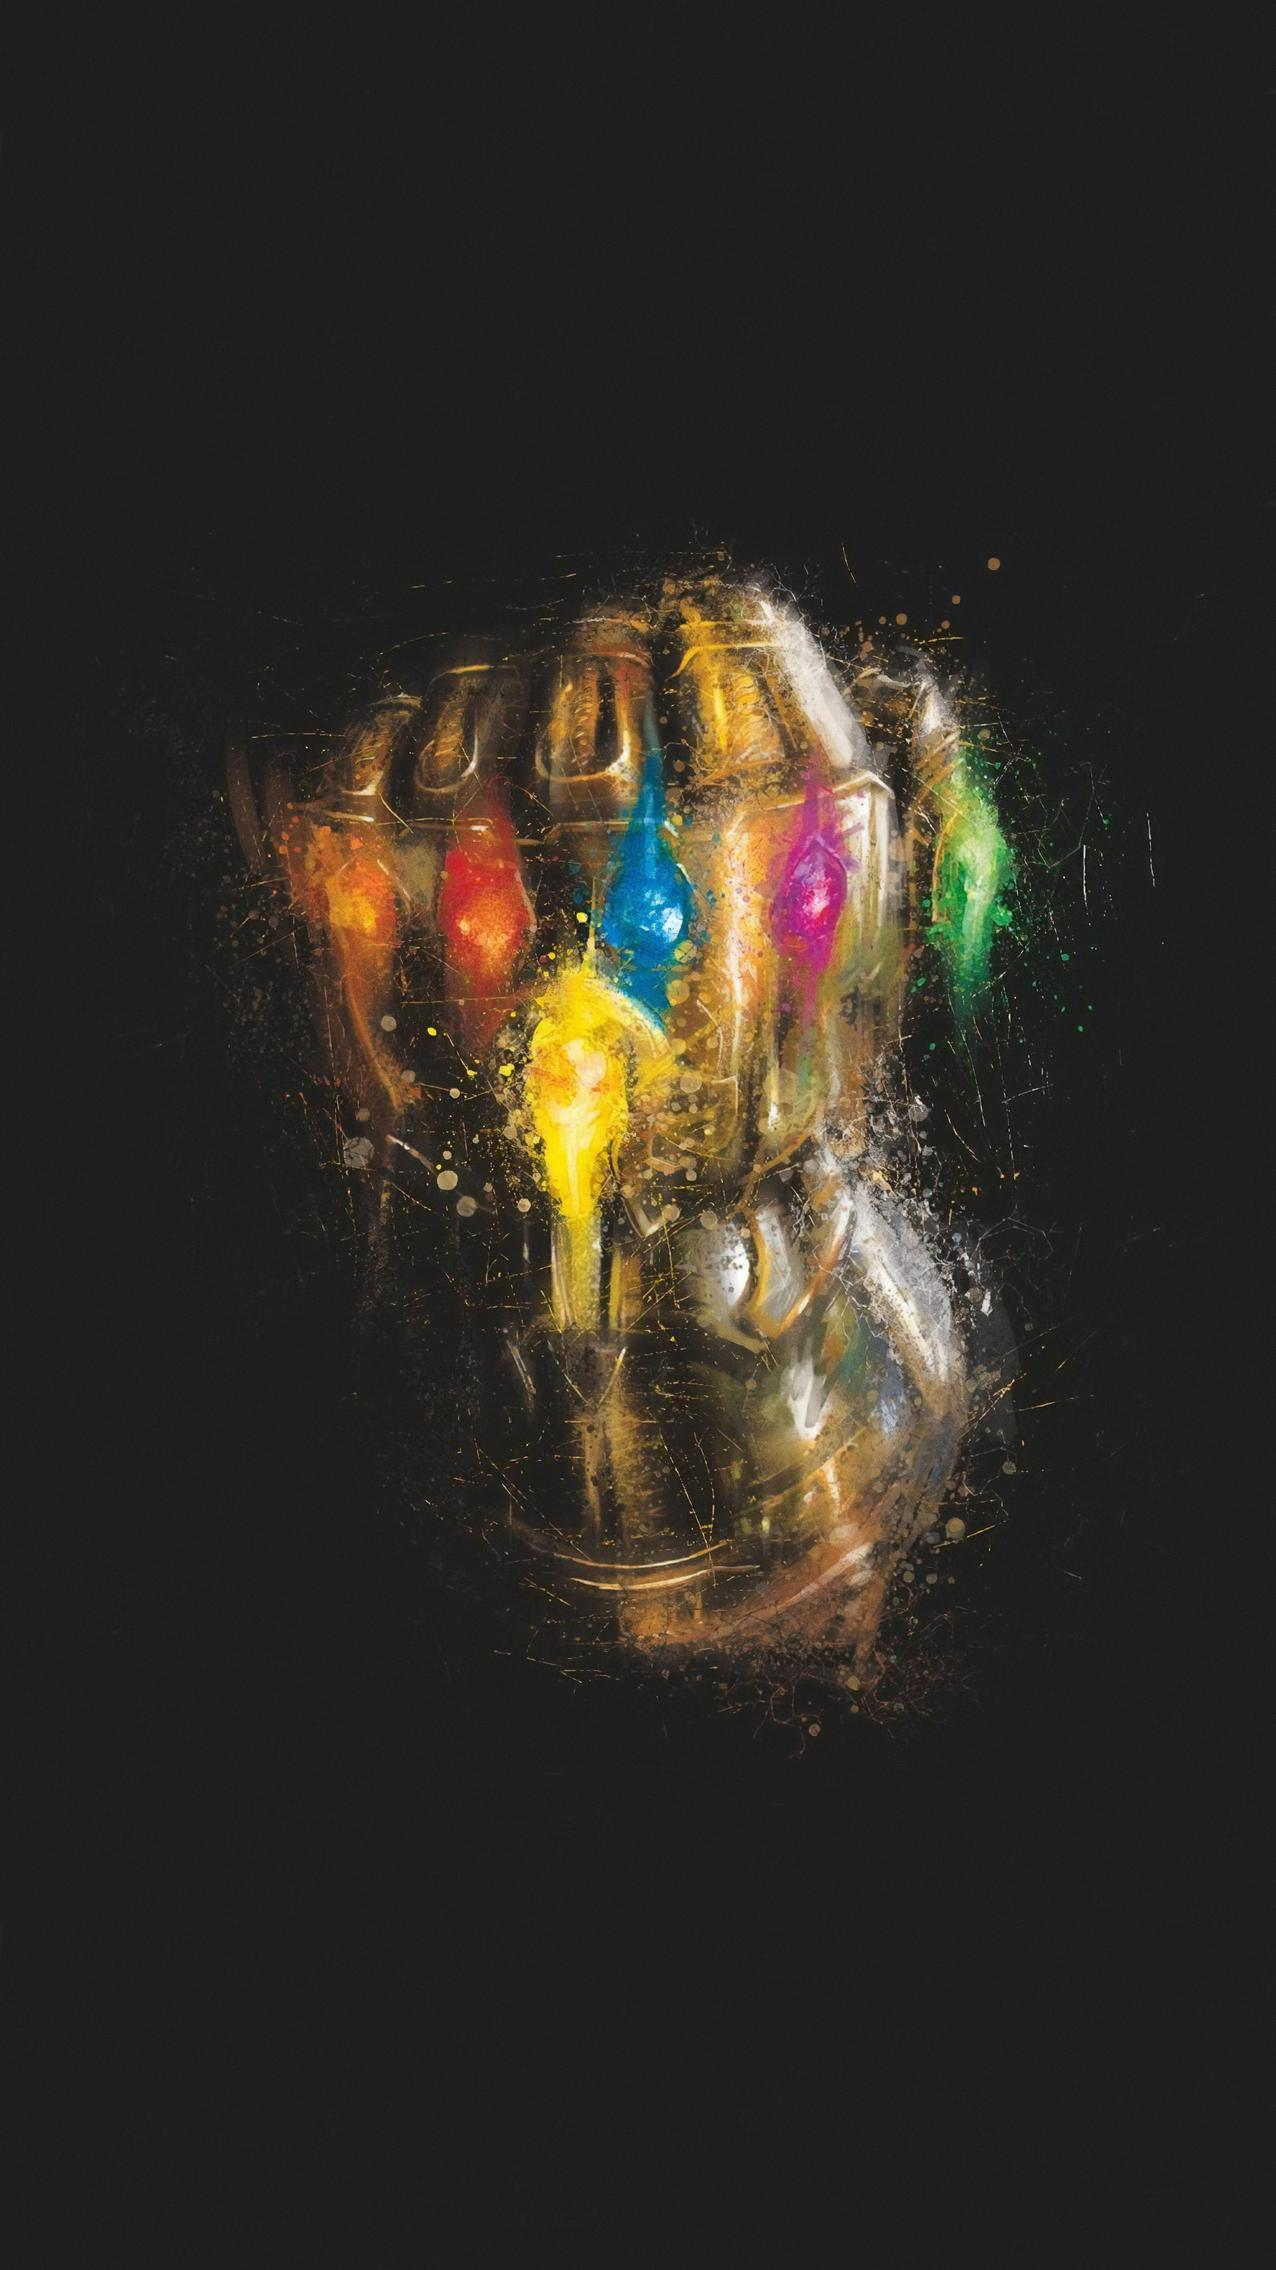 Avengers Endgame (2019) Phone Wallpaper Лев искусство